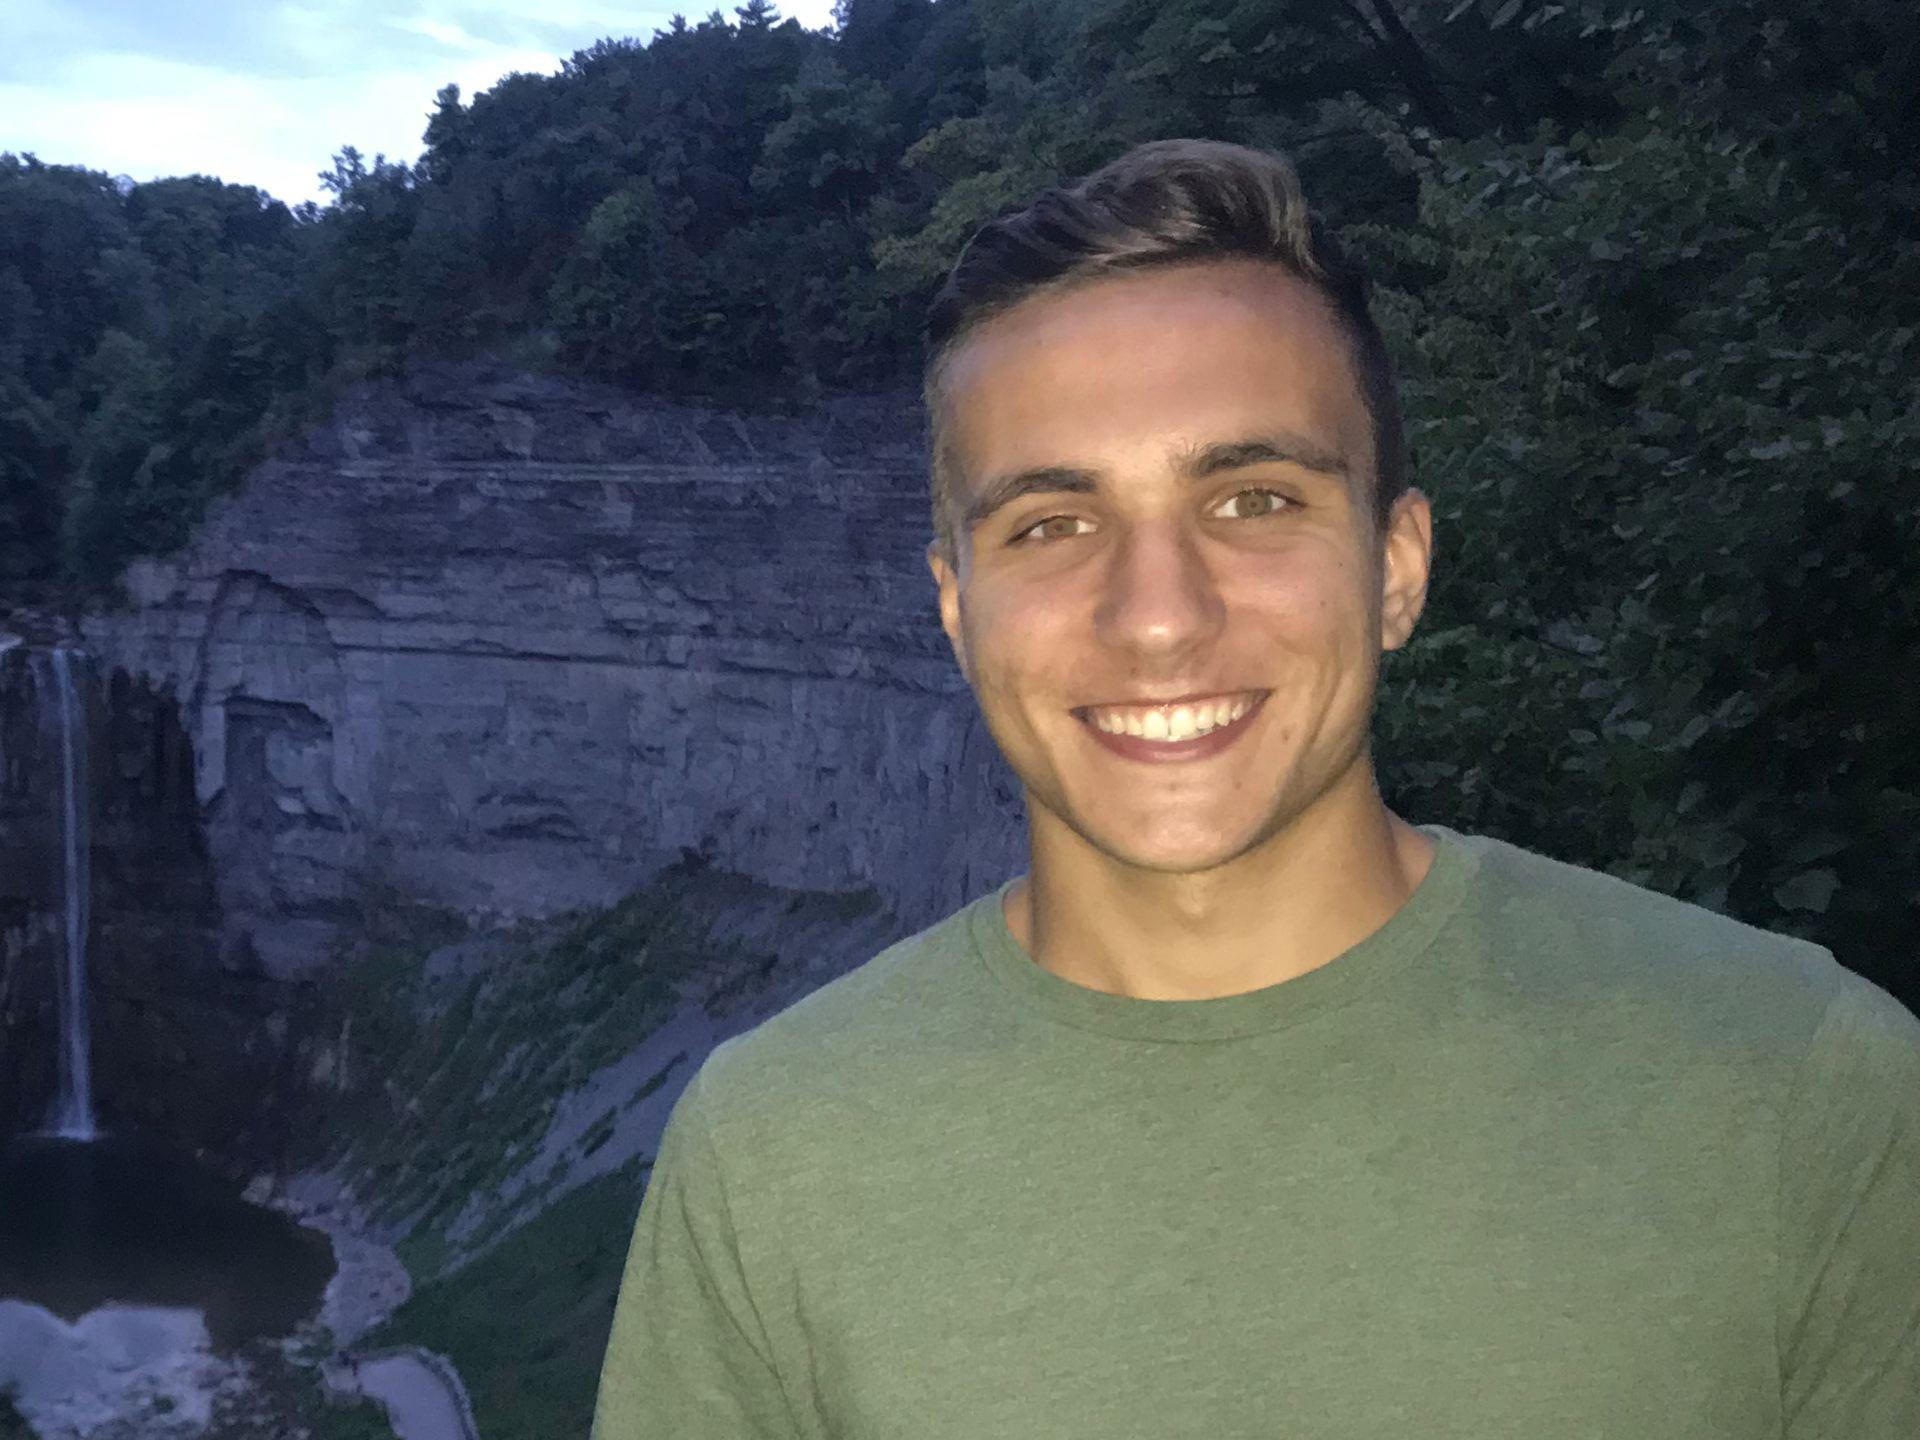 Cornell engineering student Adam